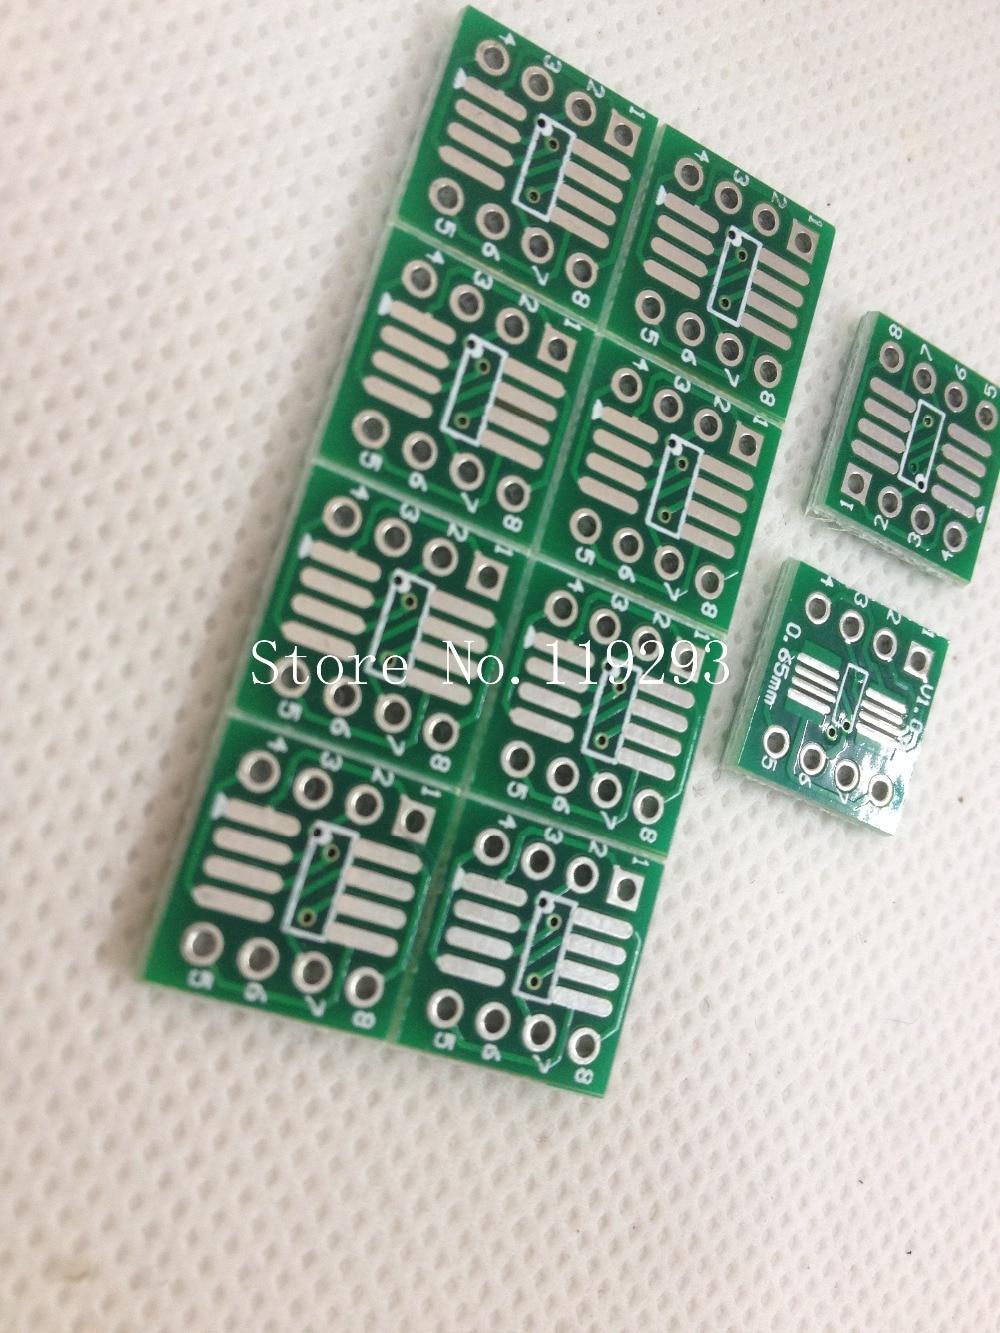 SMD test board DIP switch test socket SOP DIP op amp transfer switch DIP8 SOP8 converter board seat thickened--100PCS/LOT